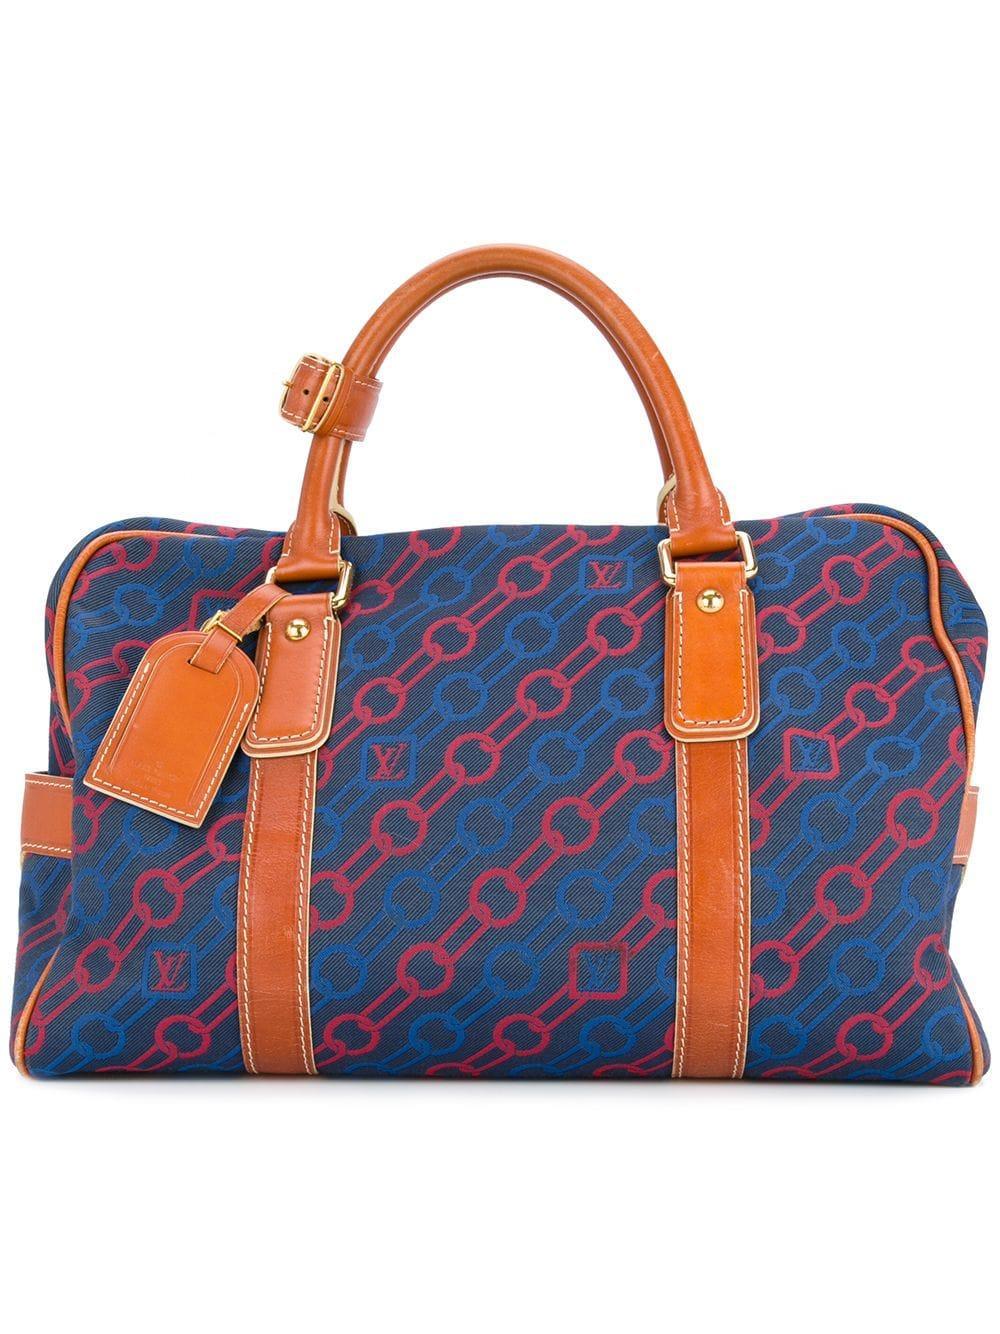 282a3e692e77e Louis Vuitton Vintage Charm Line Travel Bag - Farfetch In Blue ...